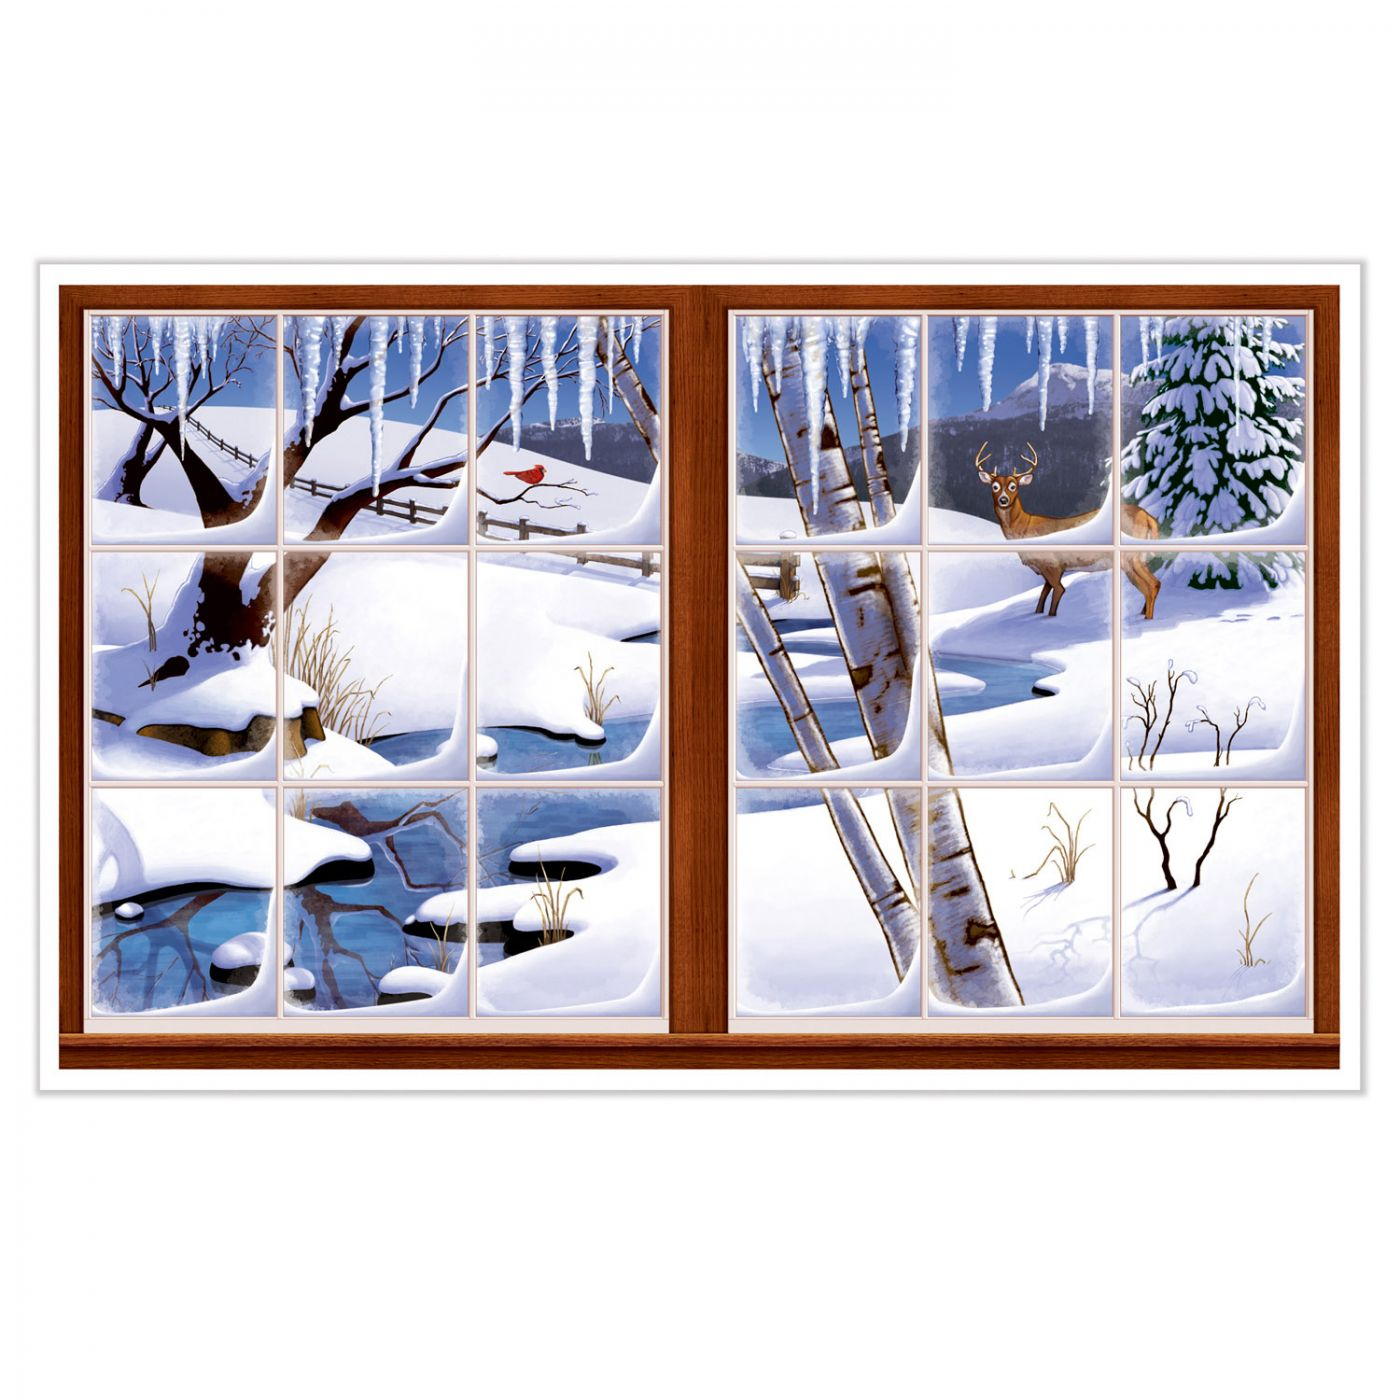 Winter Insta-View (6) image